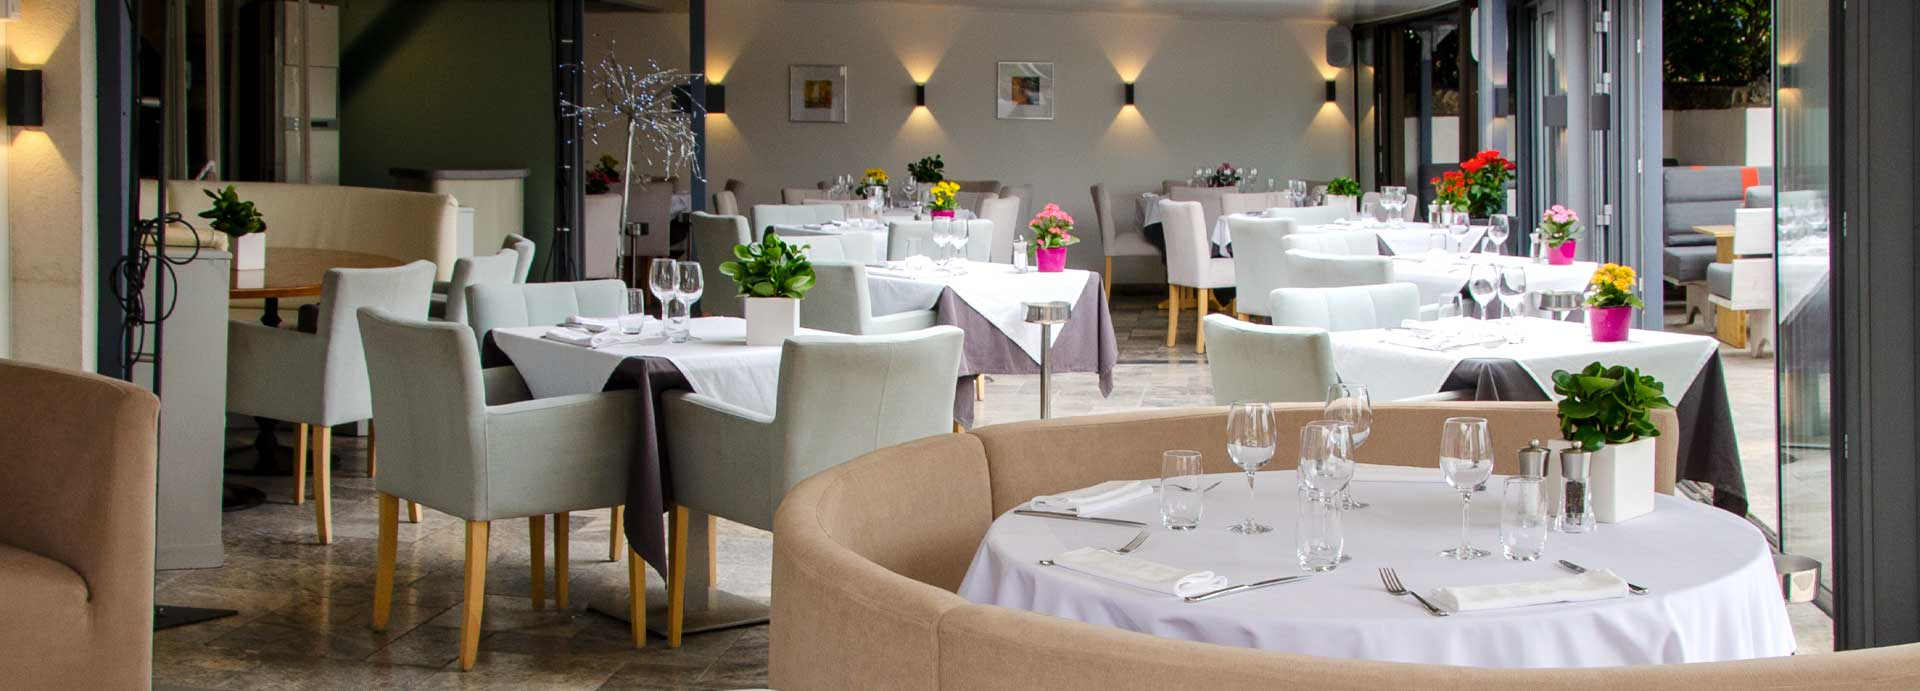 l-hermitage-restaurant-ste-maxime-2021-banner-3